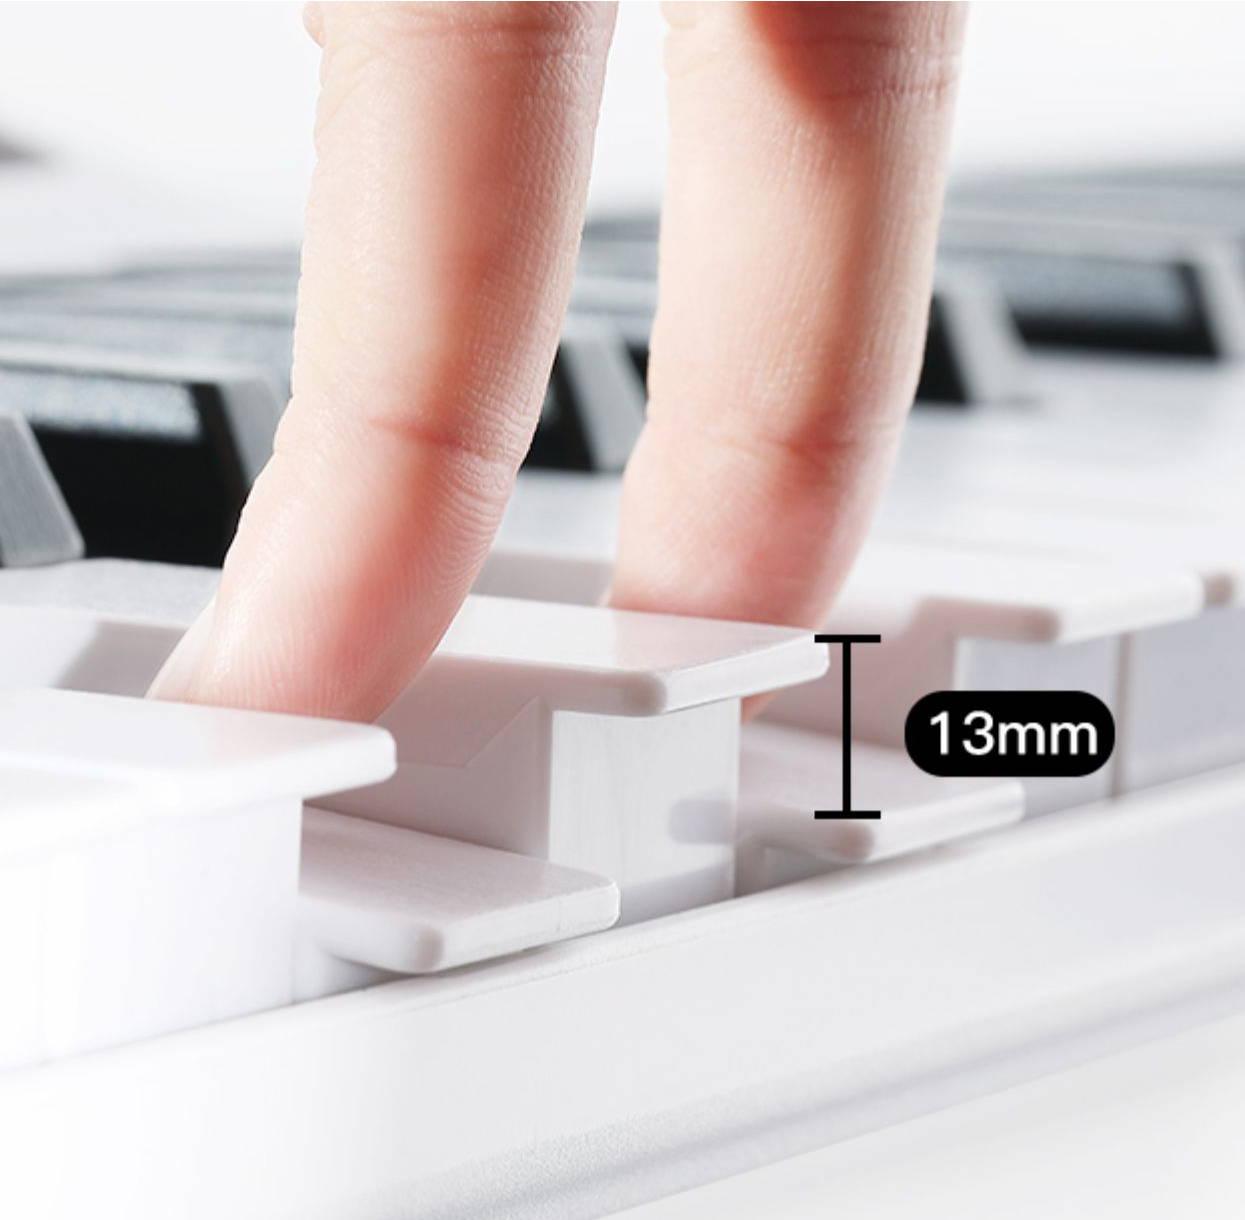 88 key keyboard for beginners, keyboard with weighted keys for beginner,  best keyboard piano for beginners